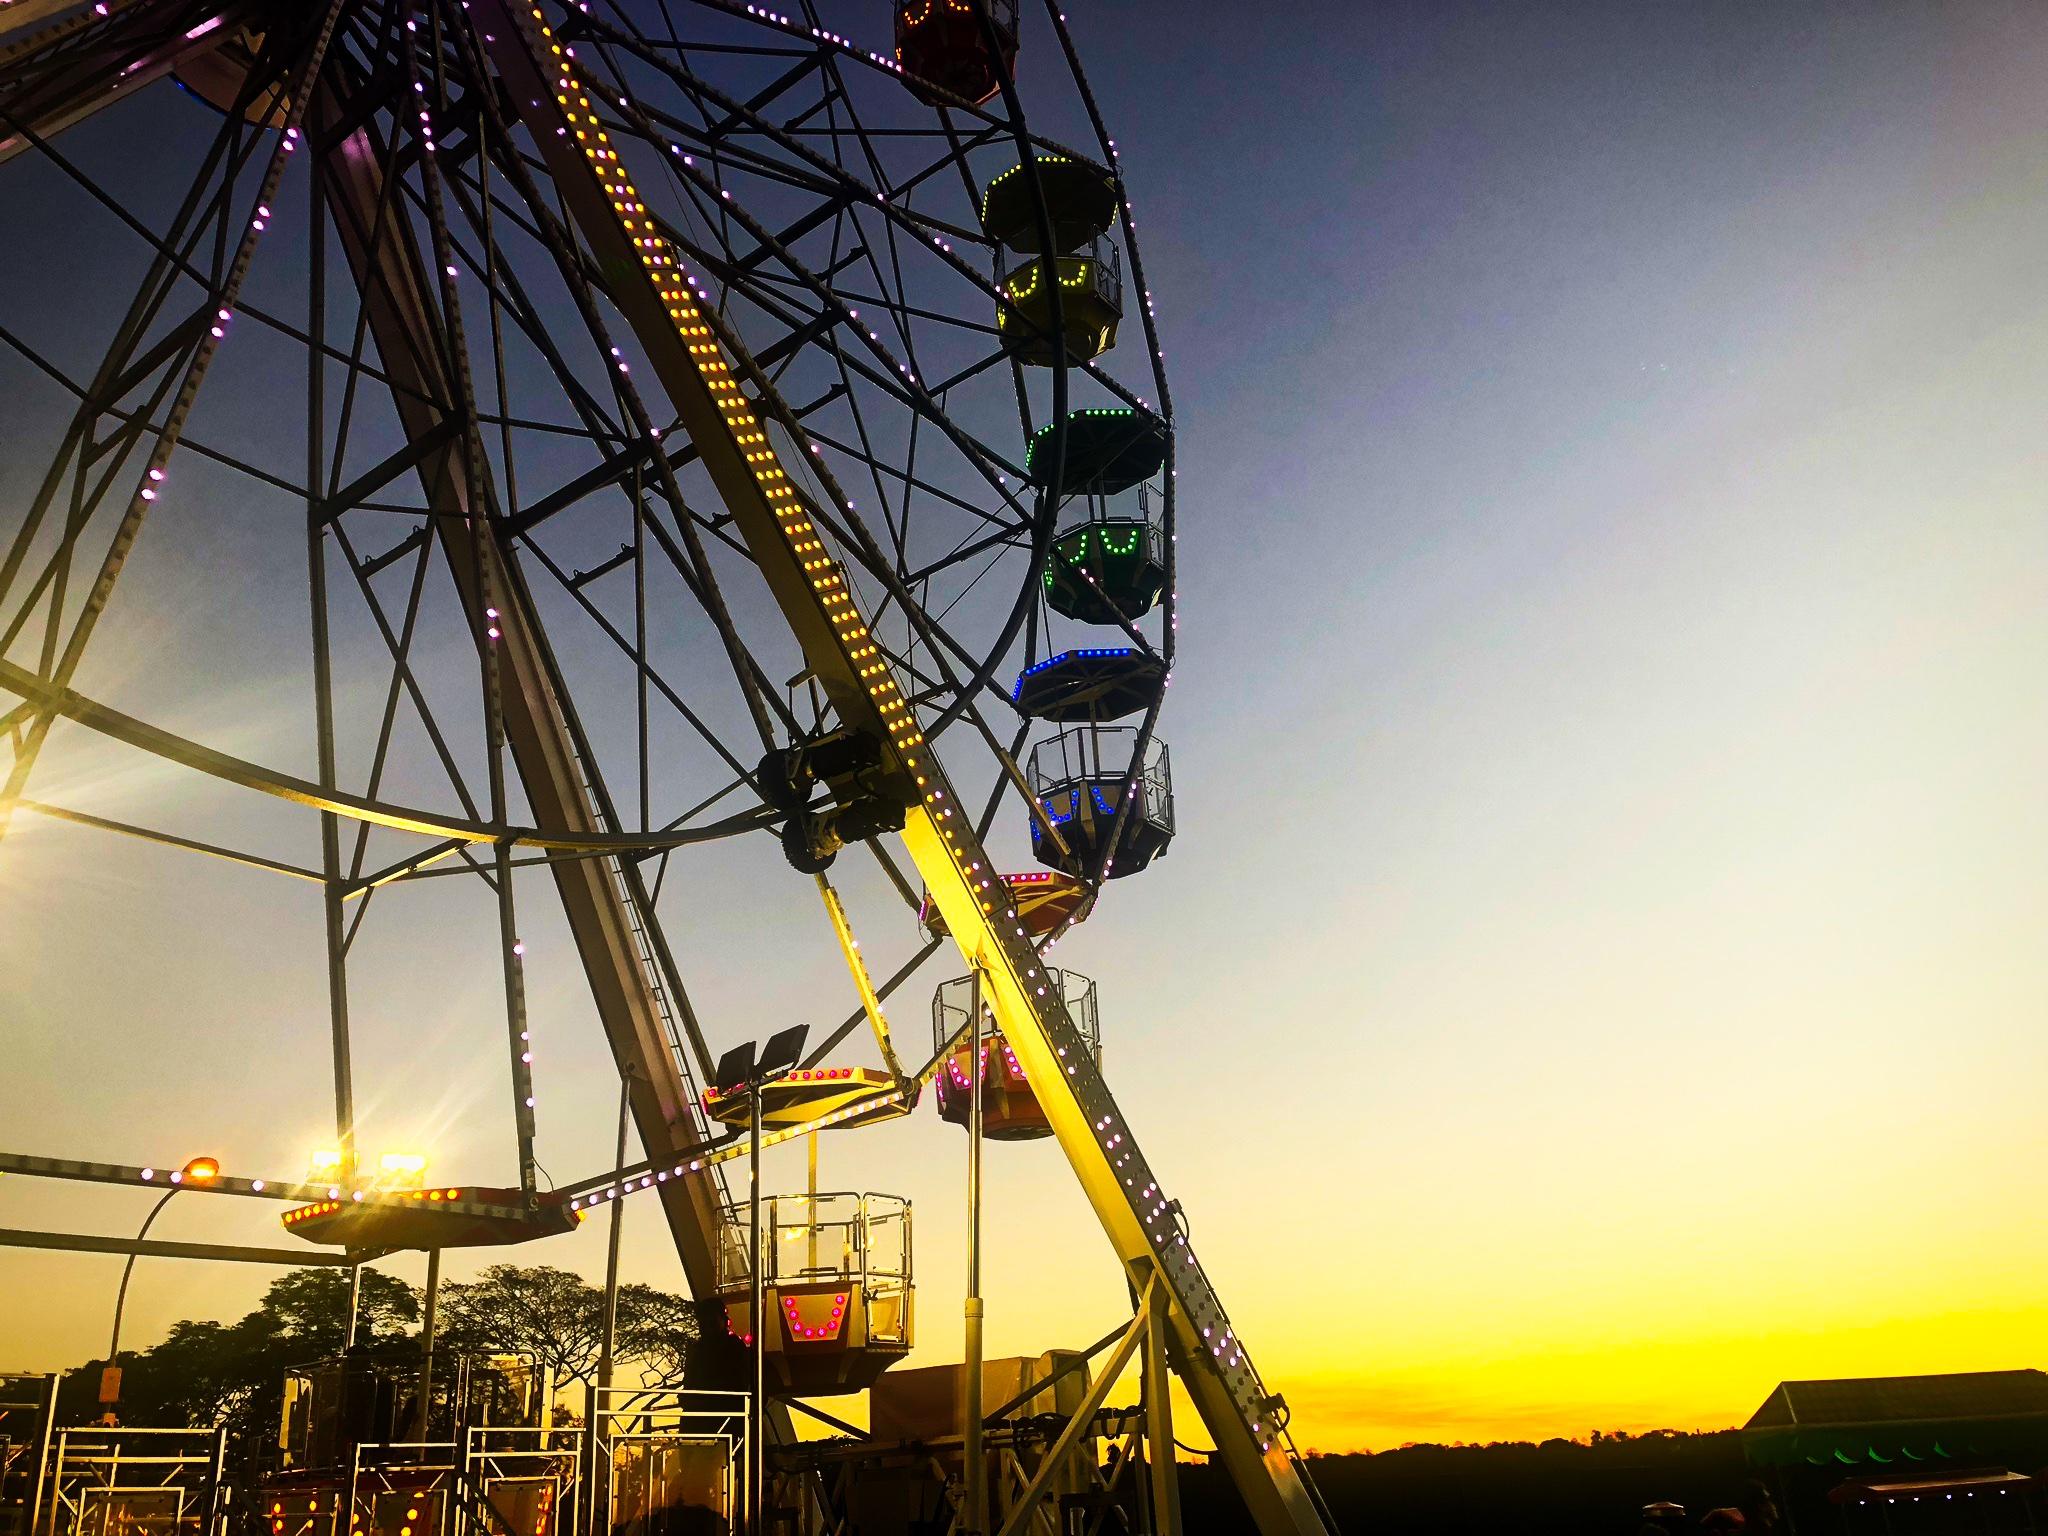 Ferris Wheel At Tres Fronteras.jpeg